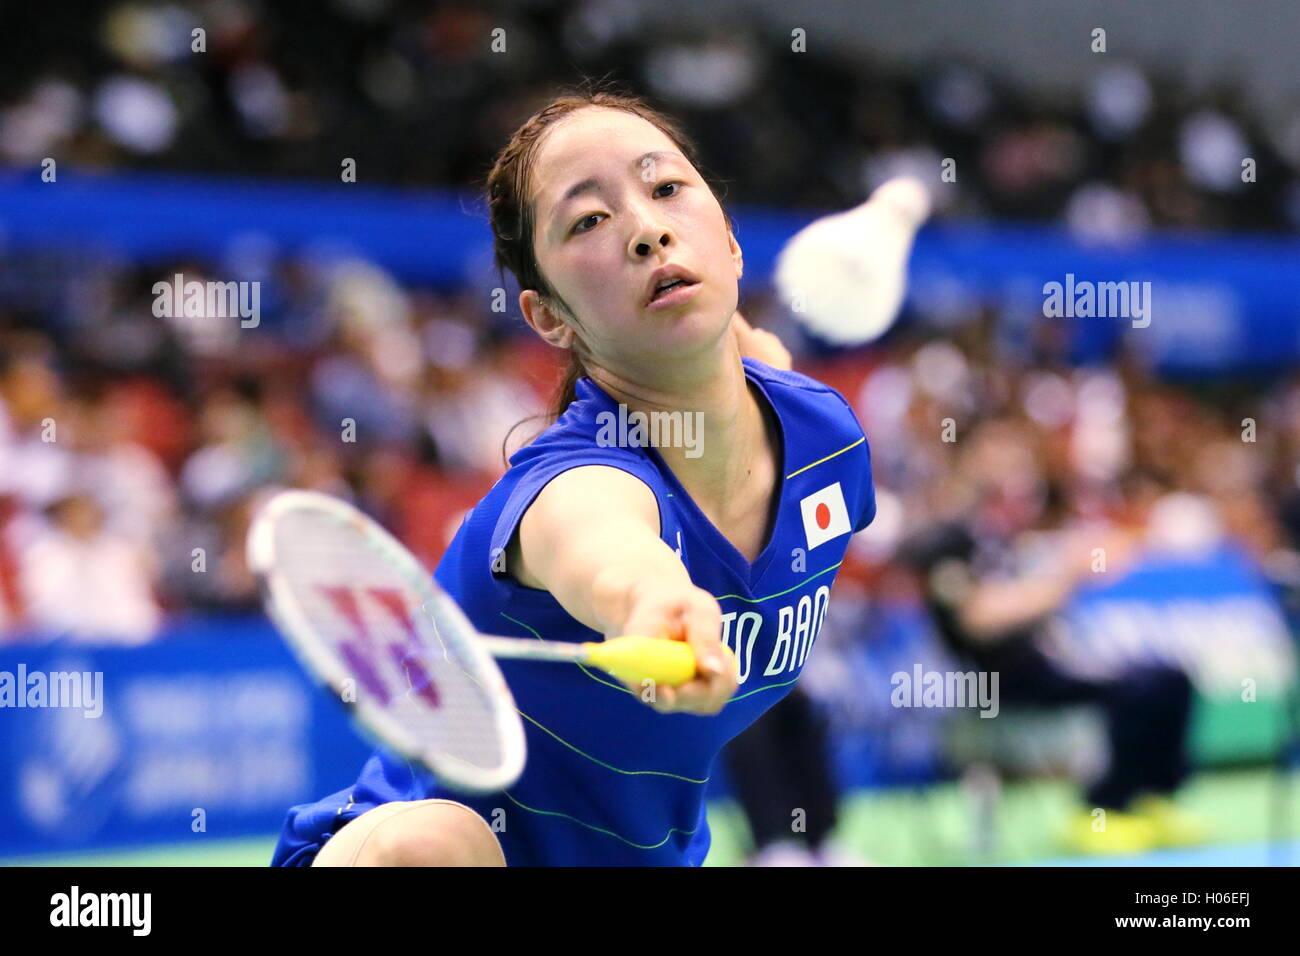 Tokyo Metropolitan Gymnasium Tokyo Japan 20th Sep 2016 Saena